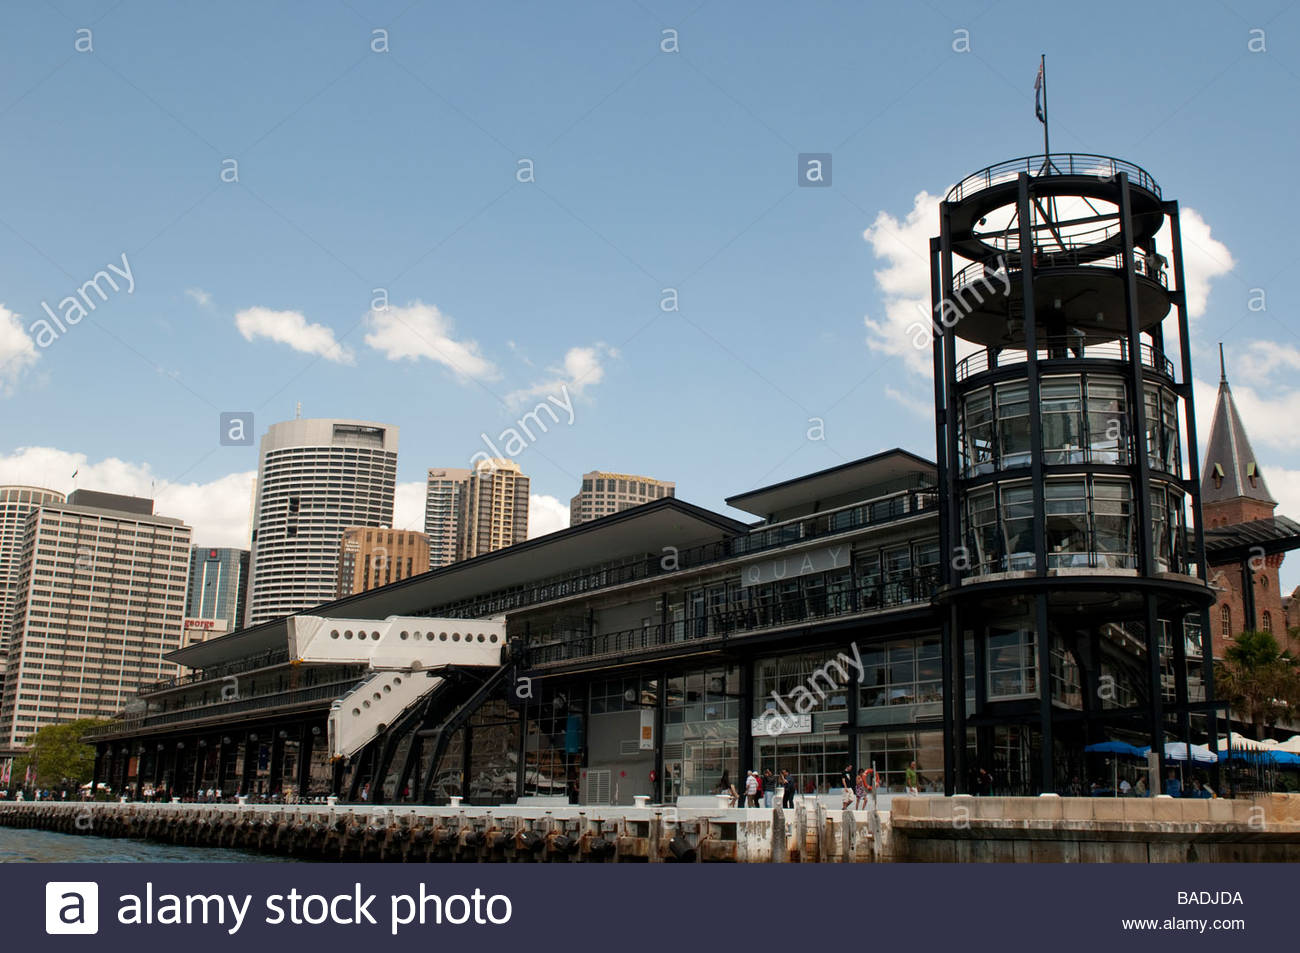 Overseas Passenger Terminal Sydney Harbour New South Wales Australia - Stock Image